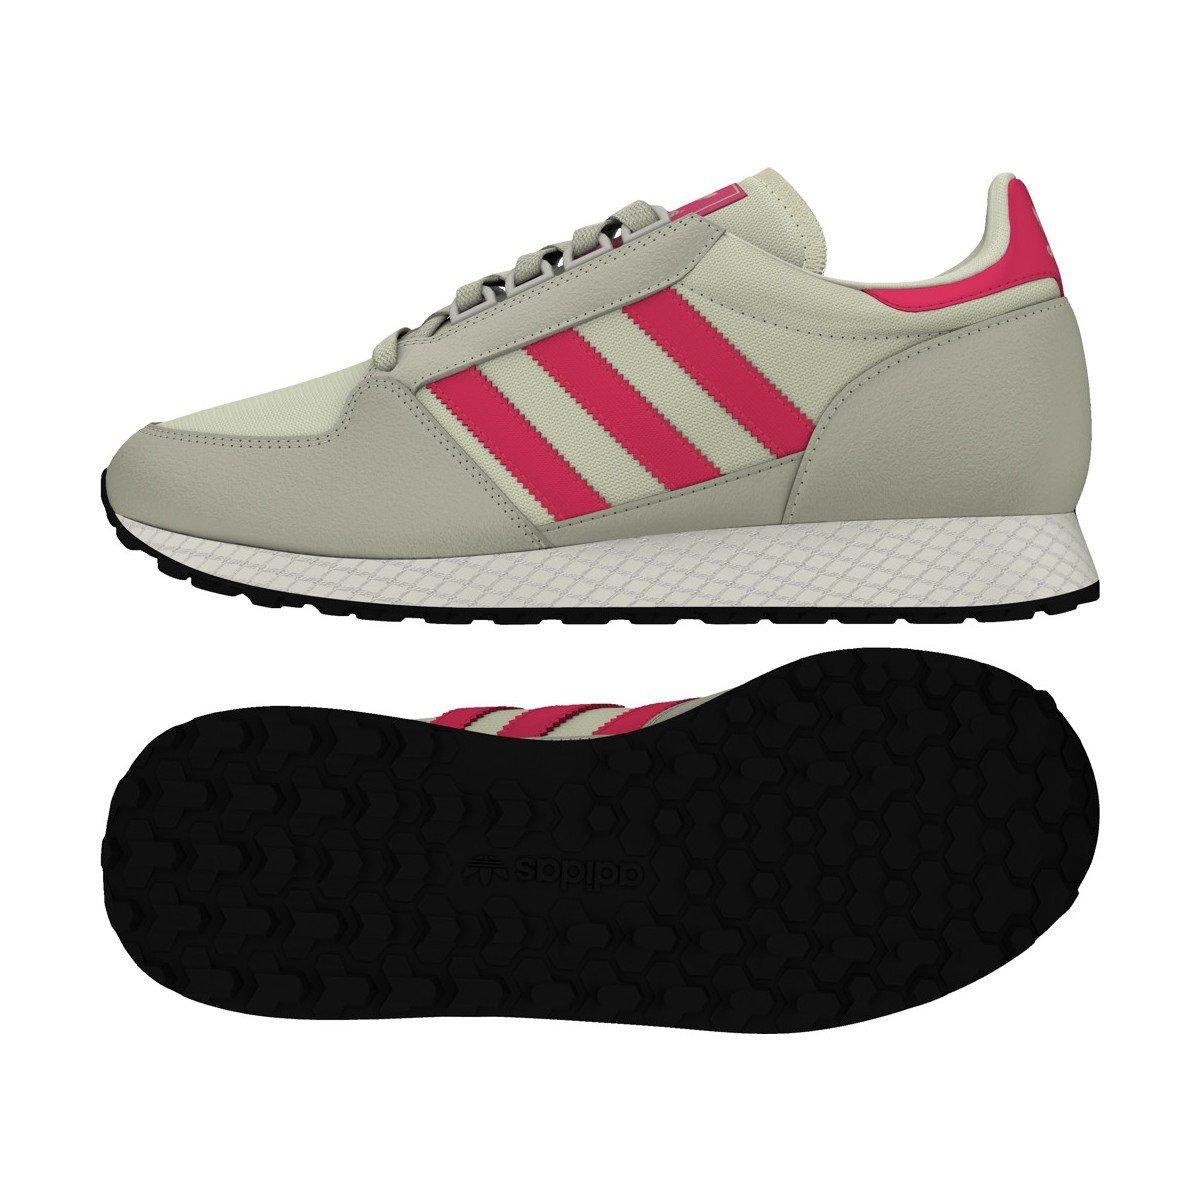 sale retailer bc65f 2f3cb adidas Originals Basket Forest Grove Junior - B37744 Amazon.fr Chaussures  et Sacs